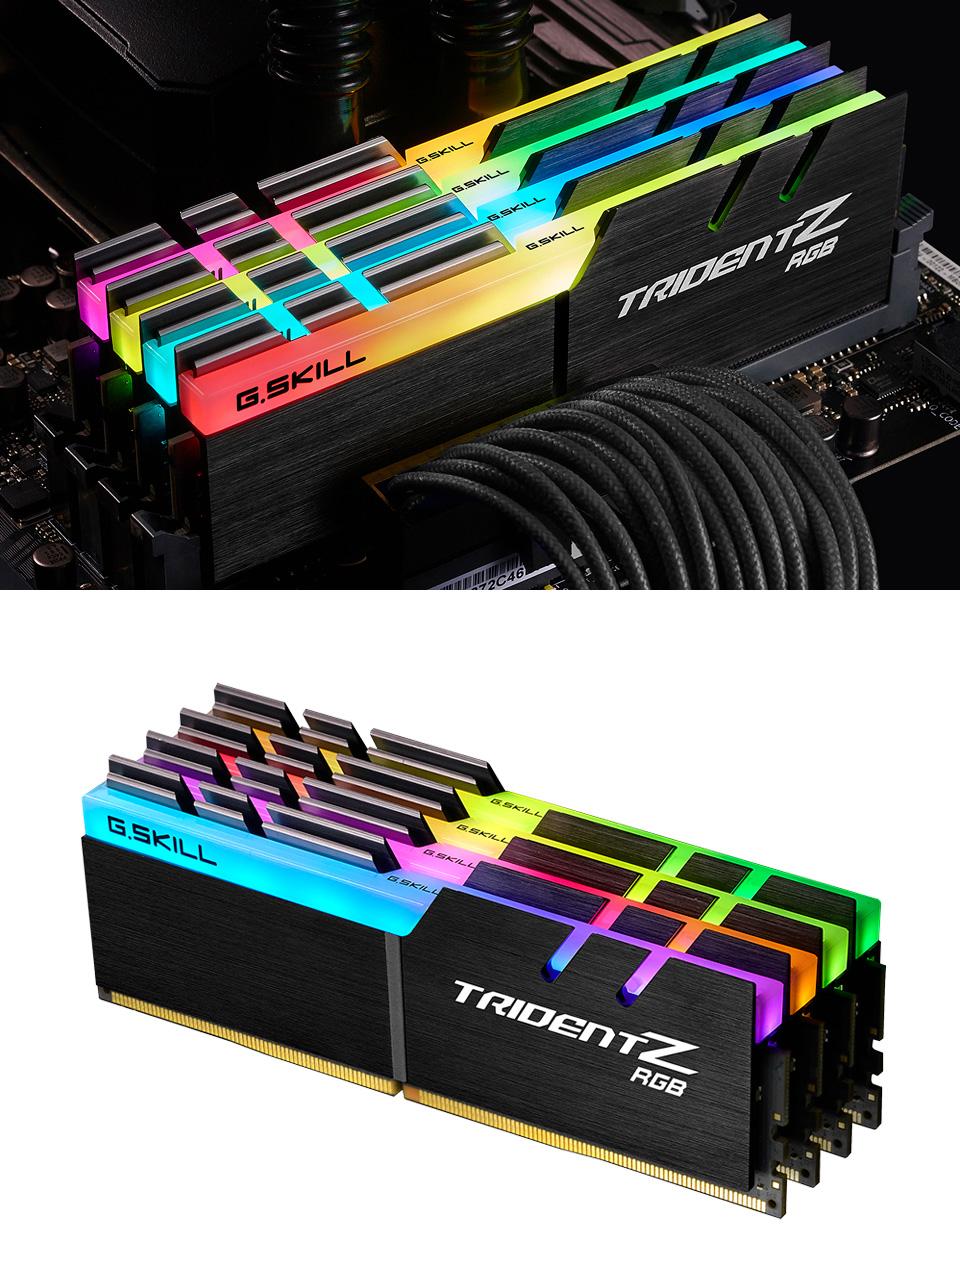 G.Skill Trident Z RGB F4-3600C16Q-64GTZR 64GB (4x16GB) DDR4 product